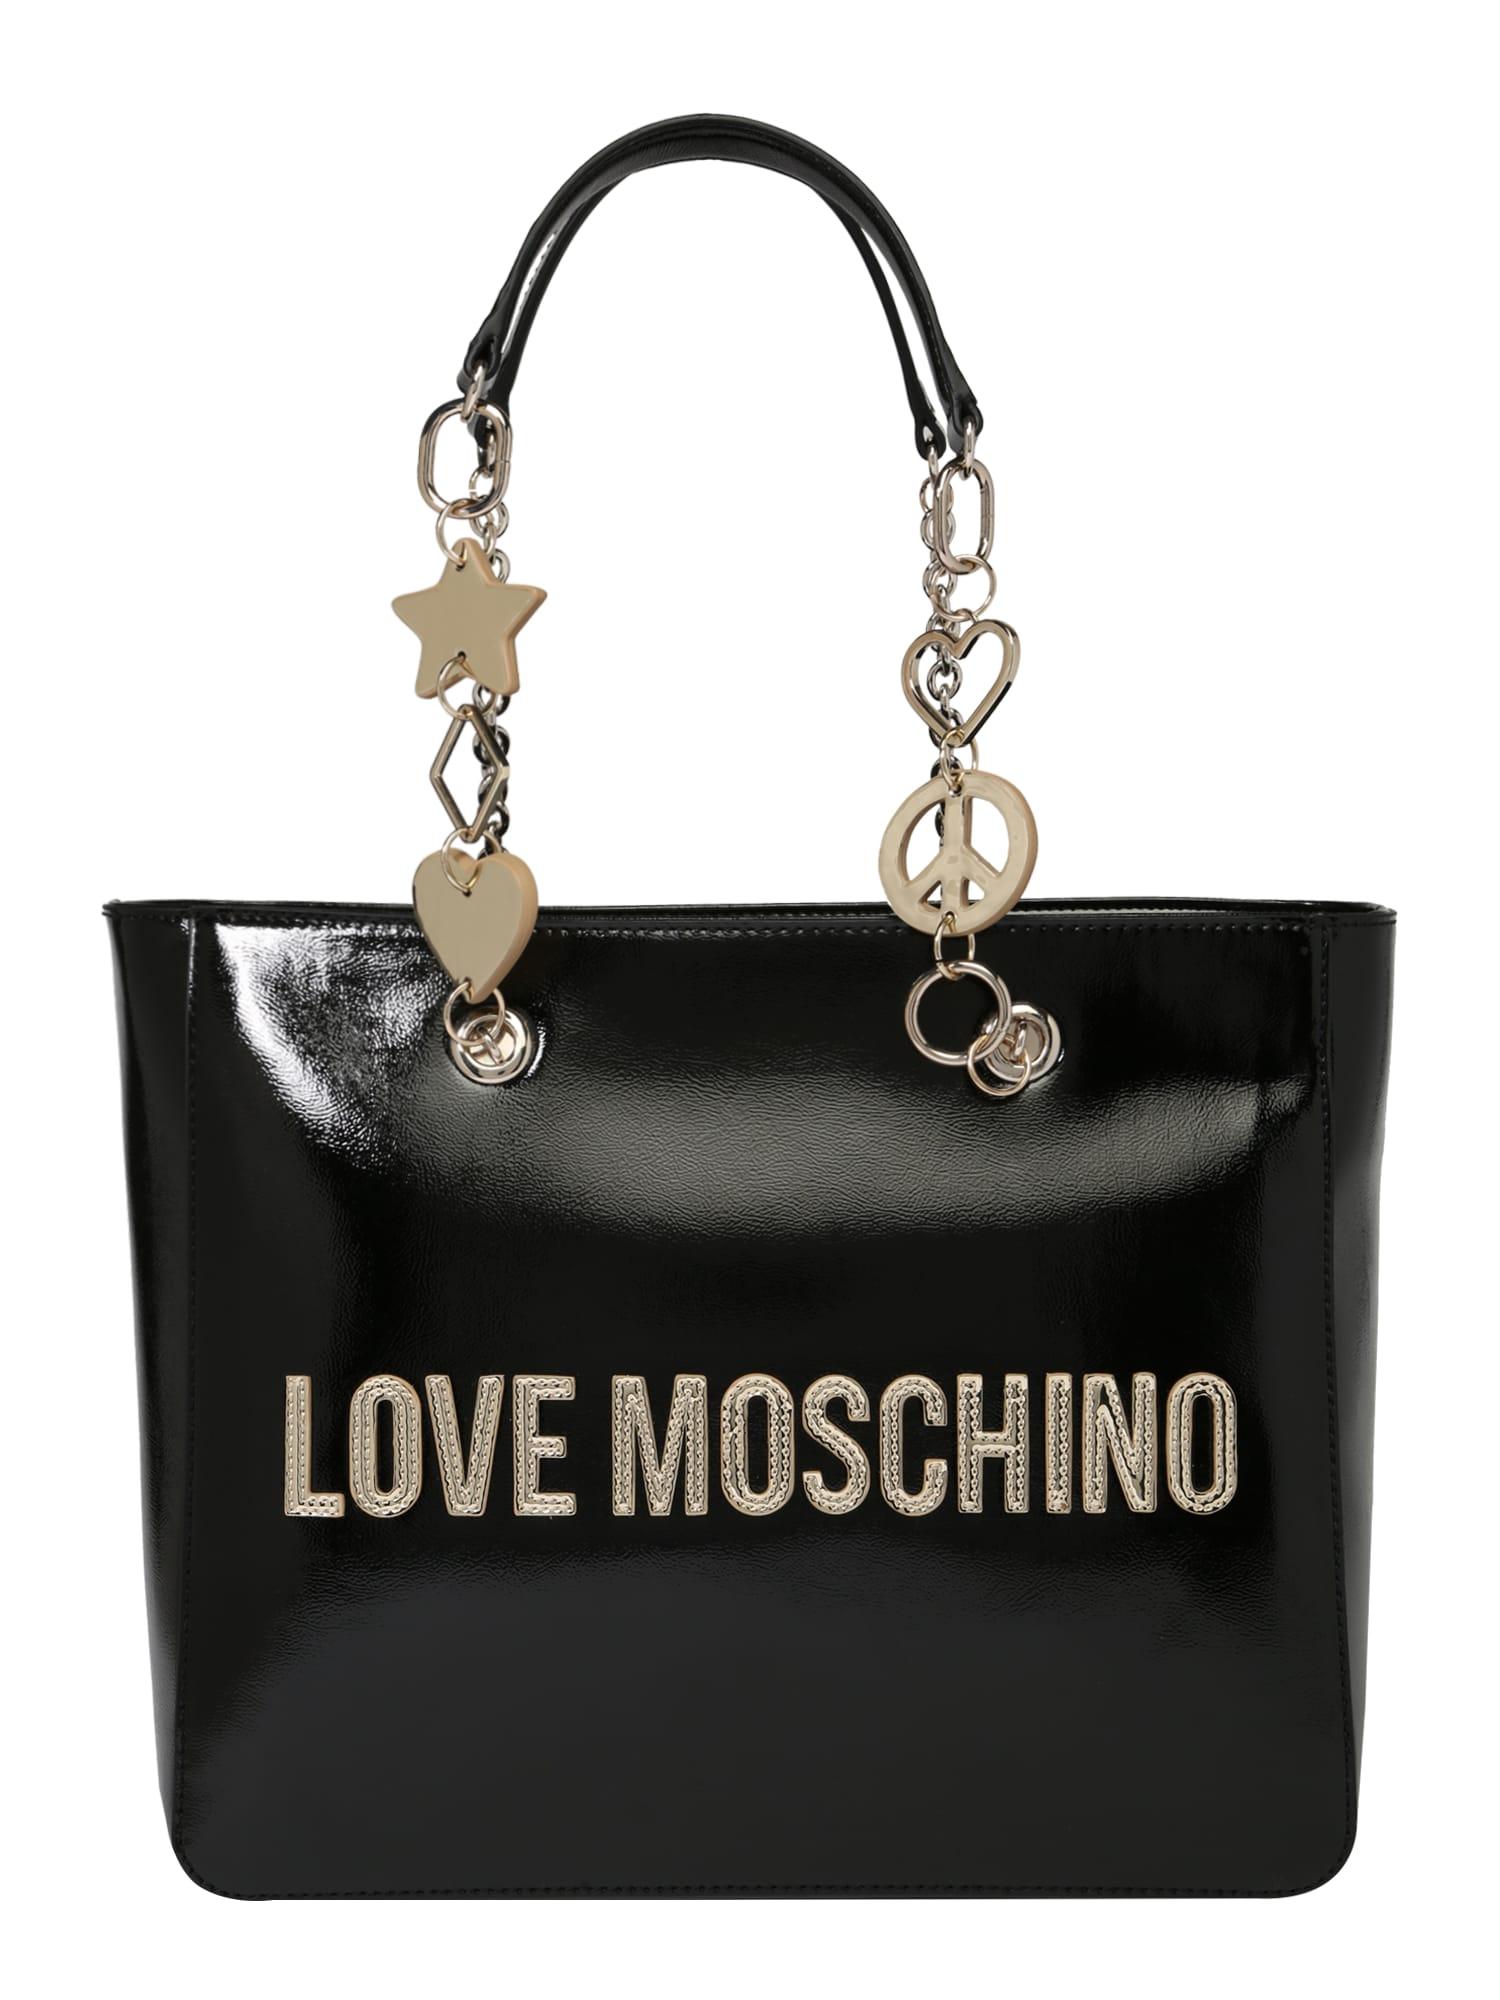 Kabelka BORSA METALLIC PU NERO černá Love Moschino